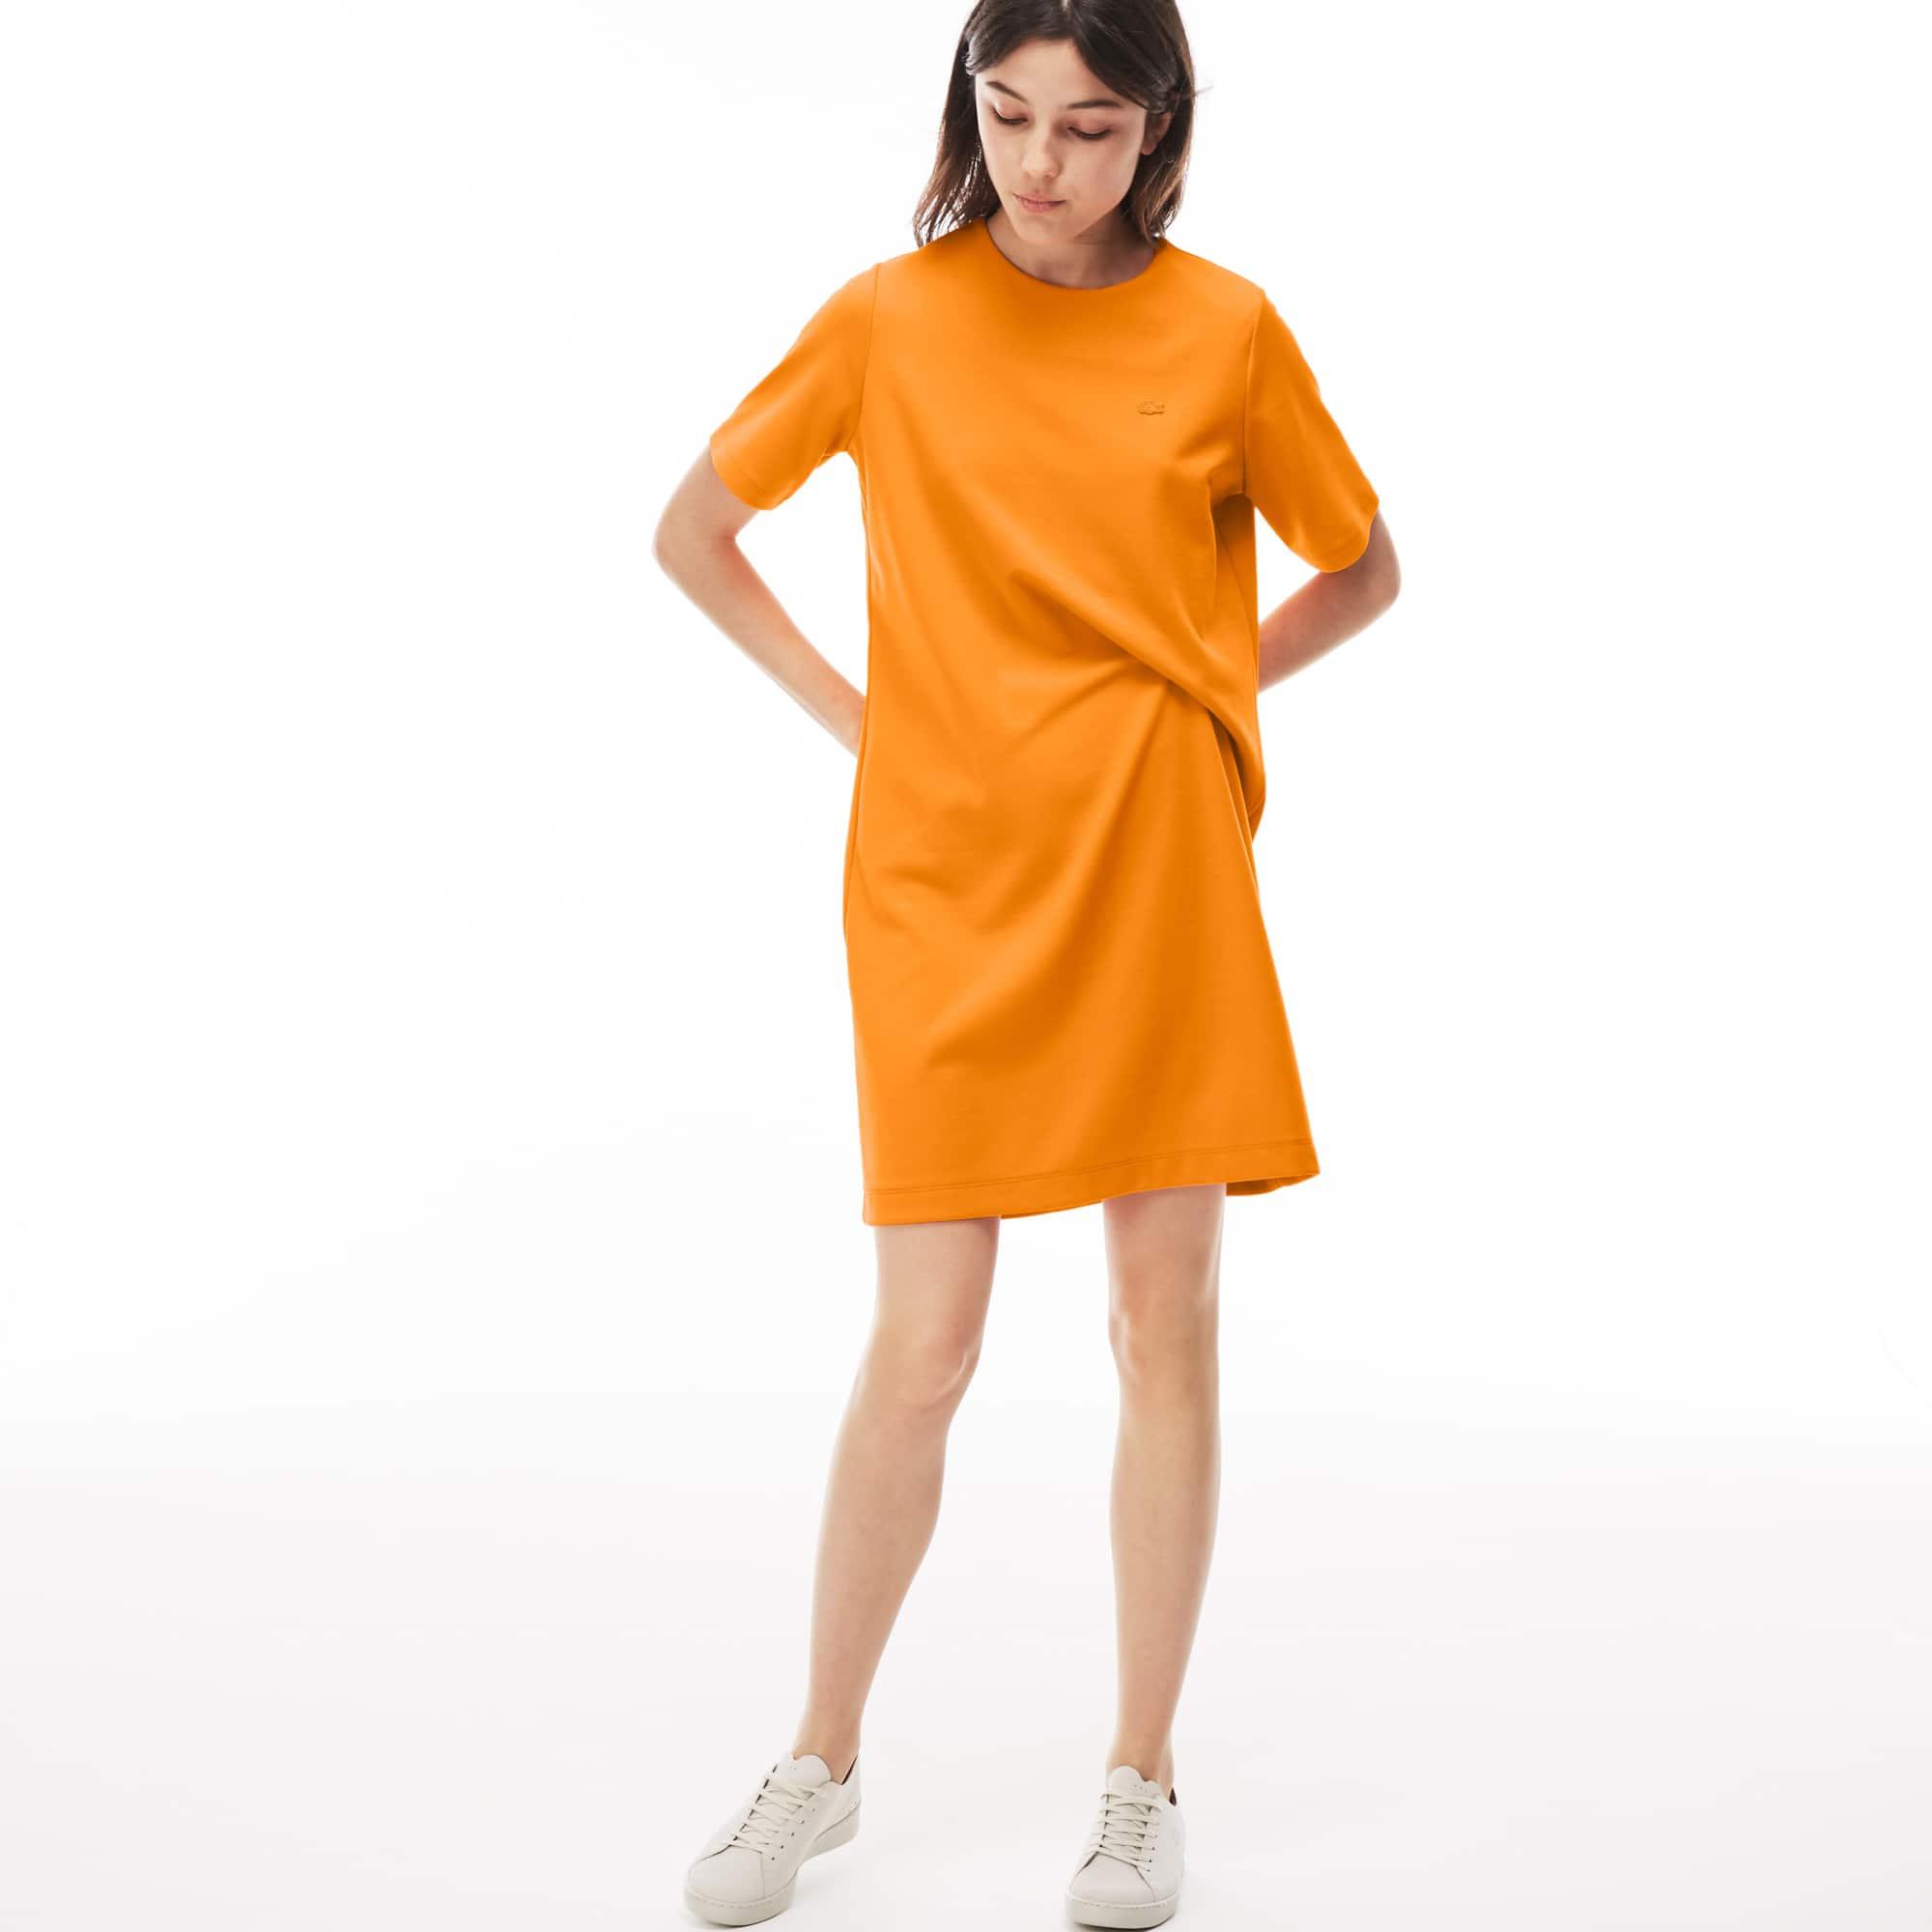 Women's Lacoste LIVE Cotton Jersey Asymmetrical Dress